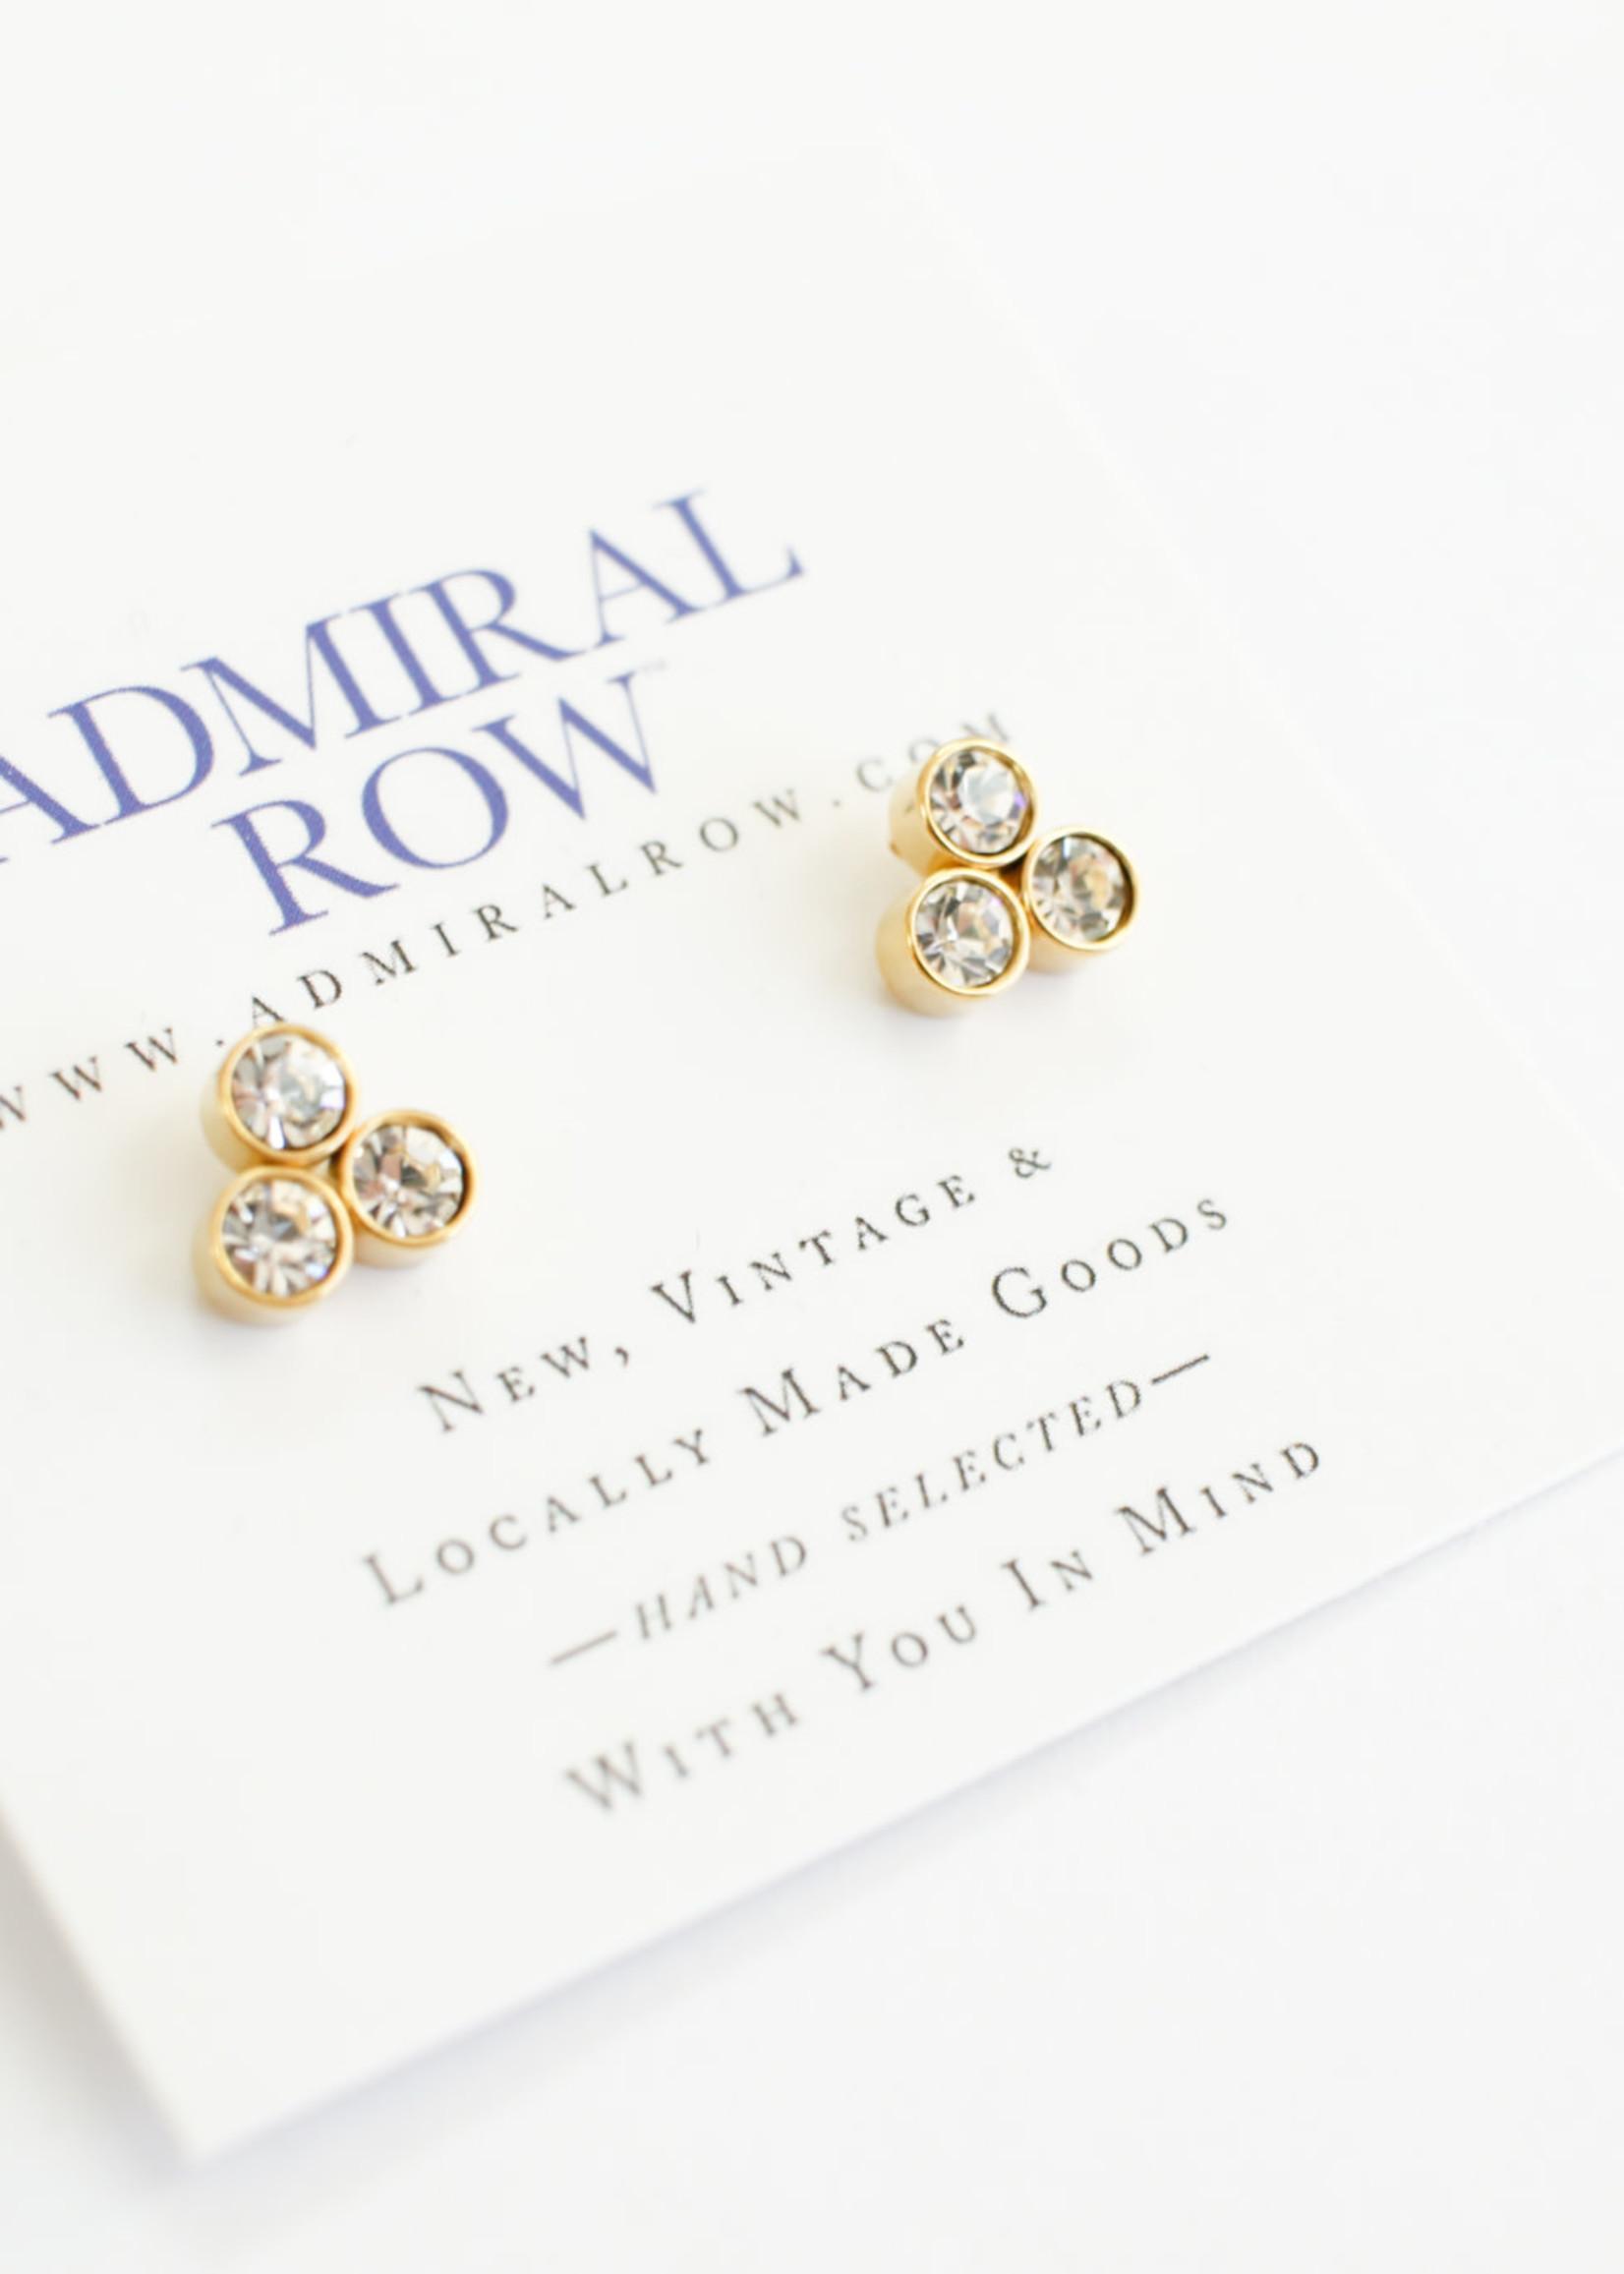 Admiral Row pave three stone stud earrings